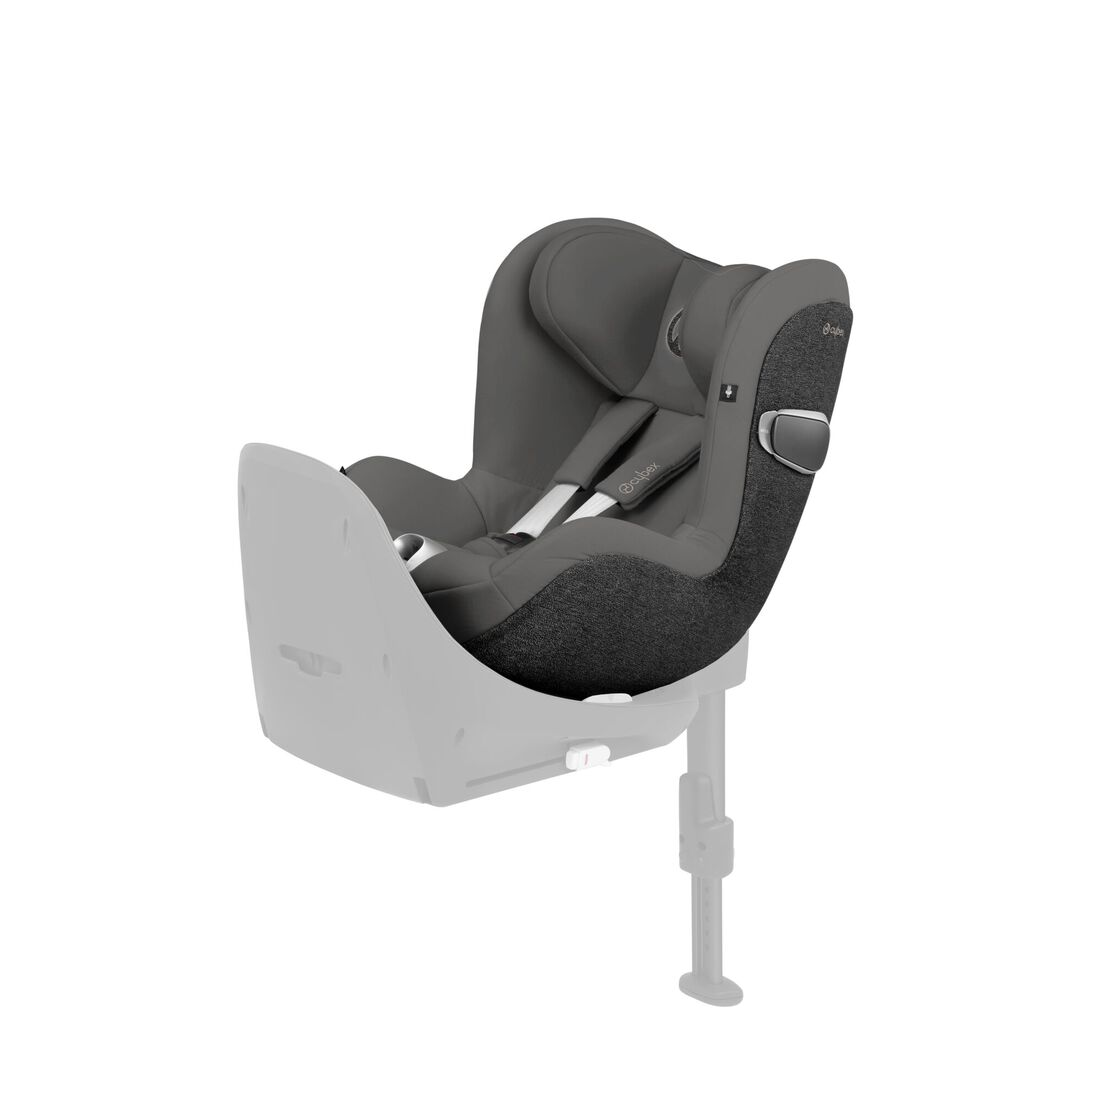 CYBEX Sirona Z i-Size - Soho Grey in Soho Grey large Bild 1